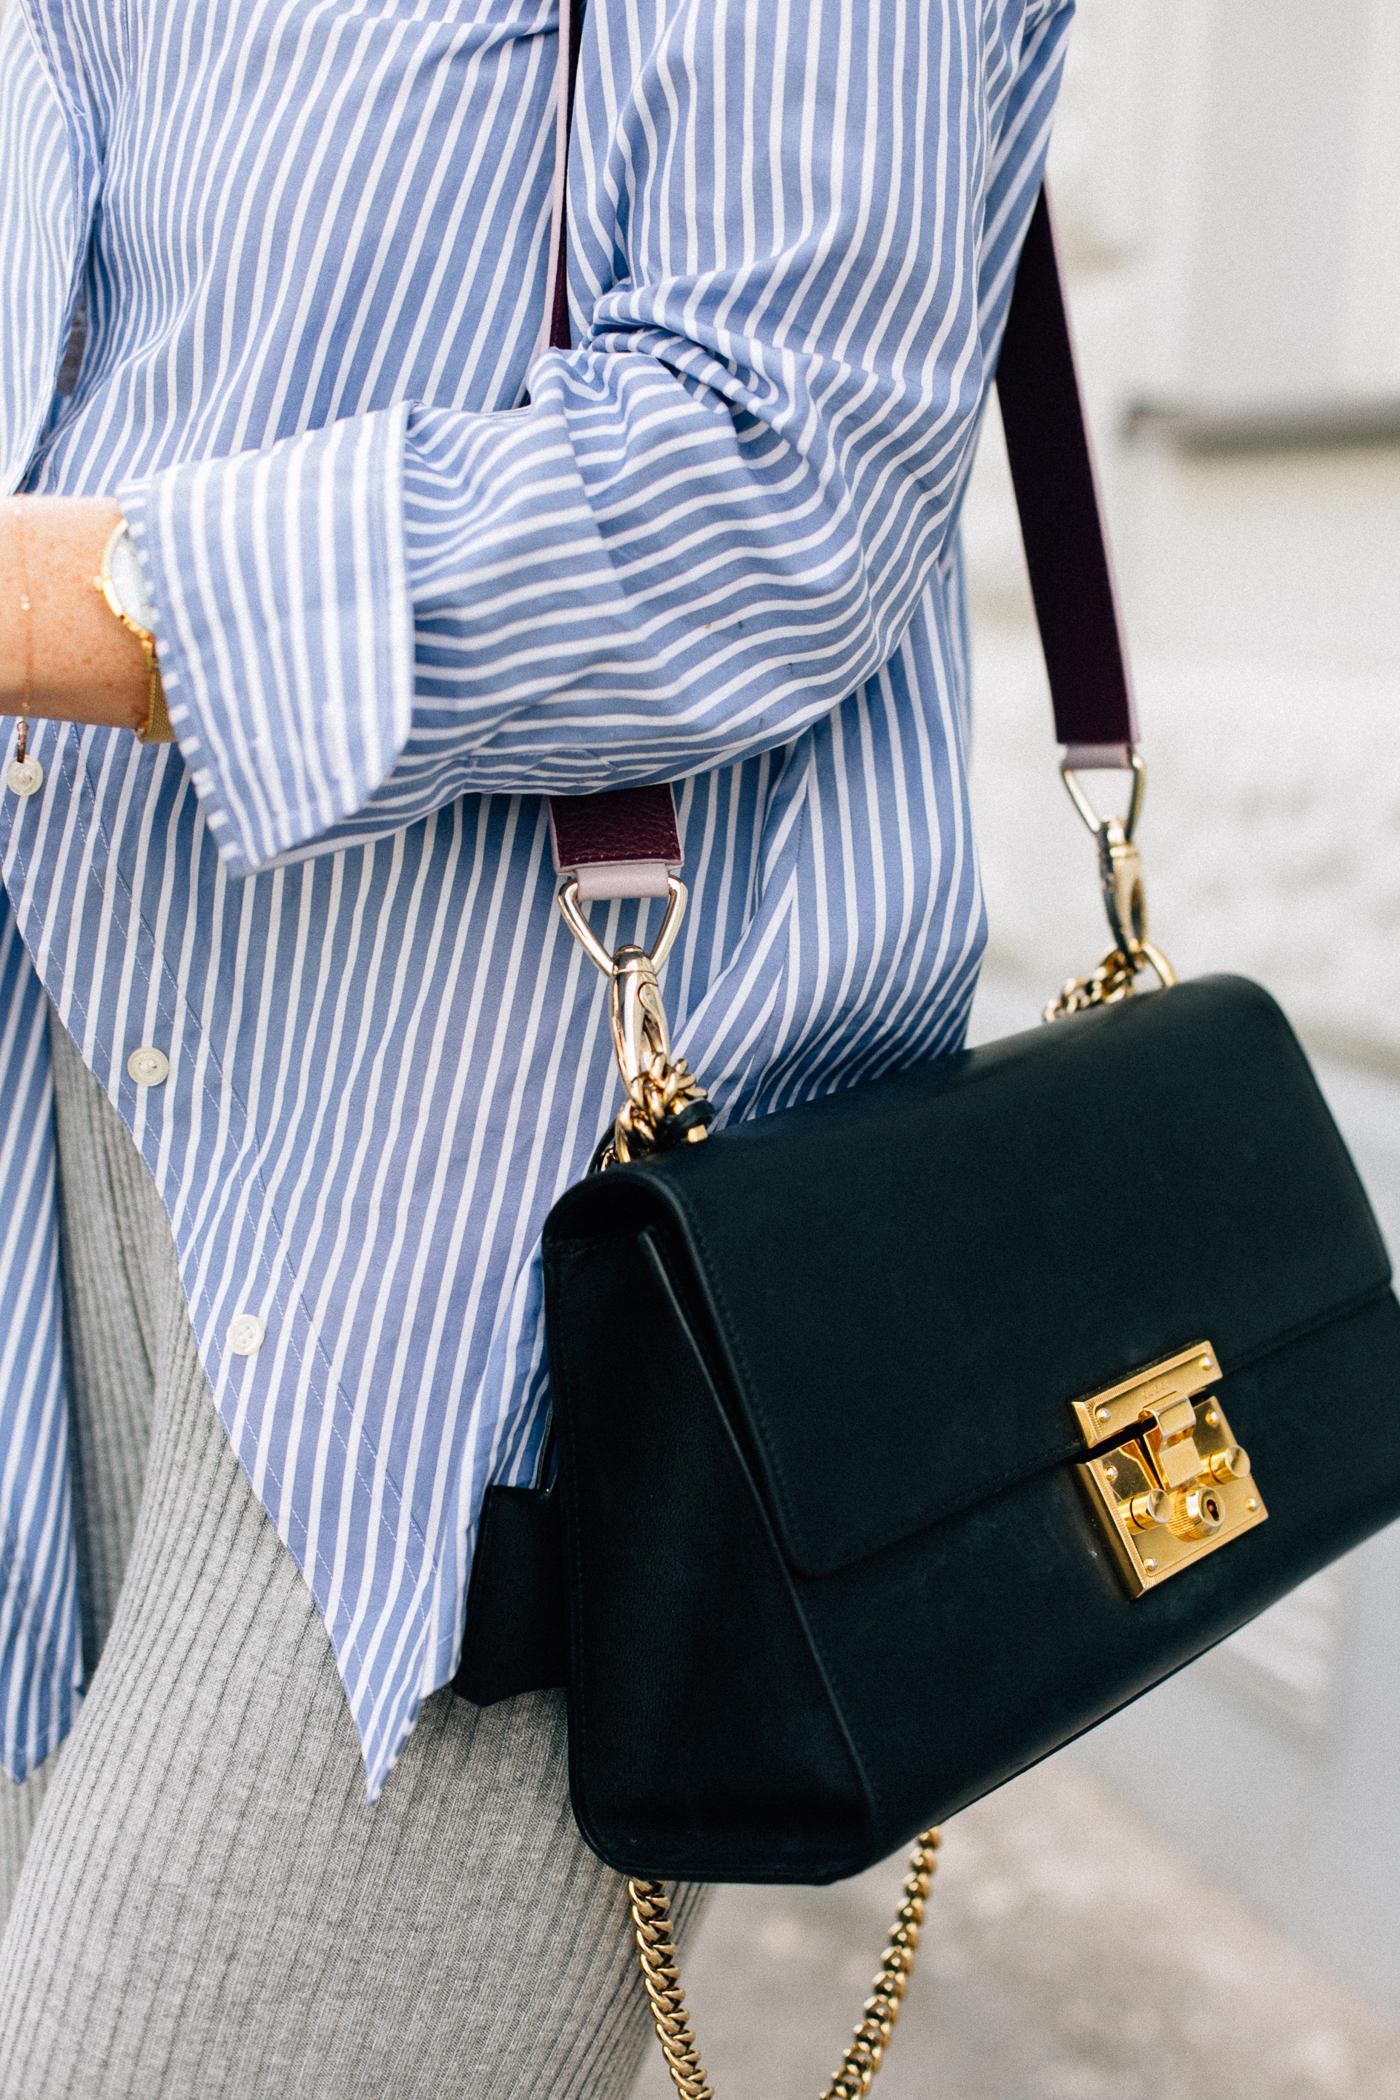 Gucci Padlock bag + Aigner strap | Bikinis & Passports